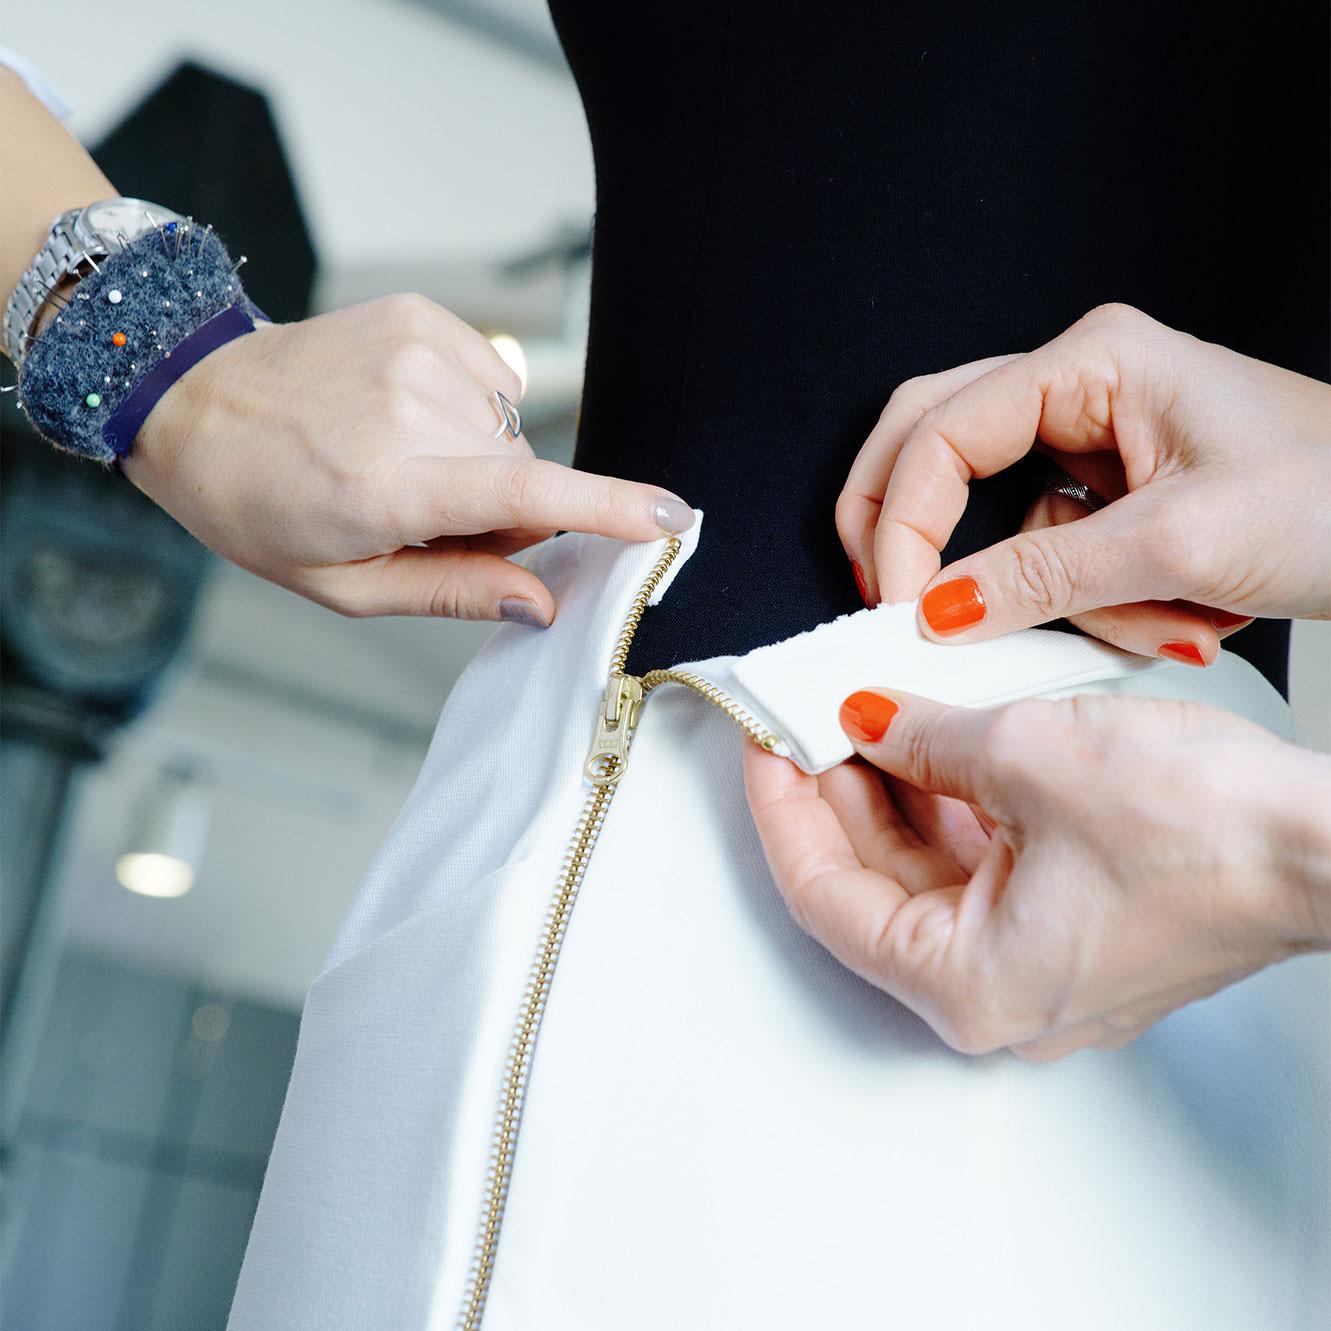 Qualitätskontrolle textile Produktion